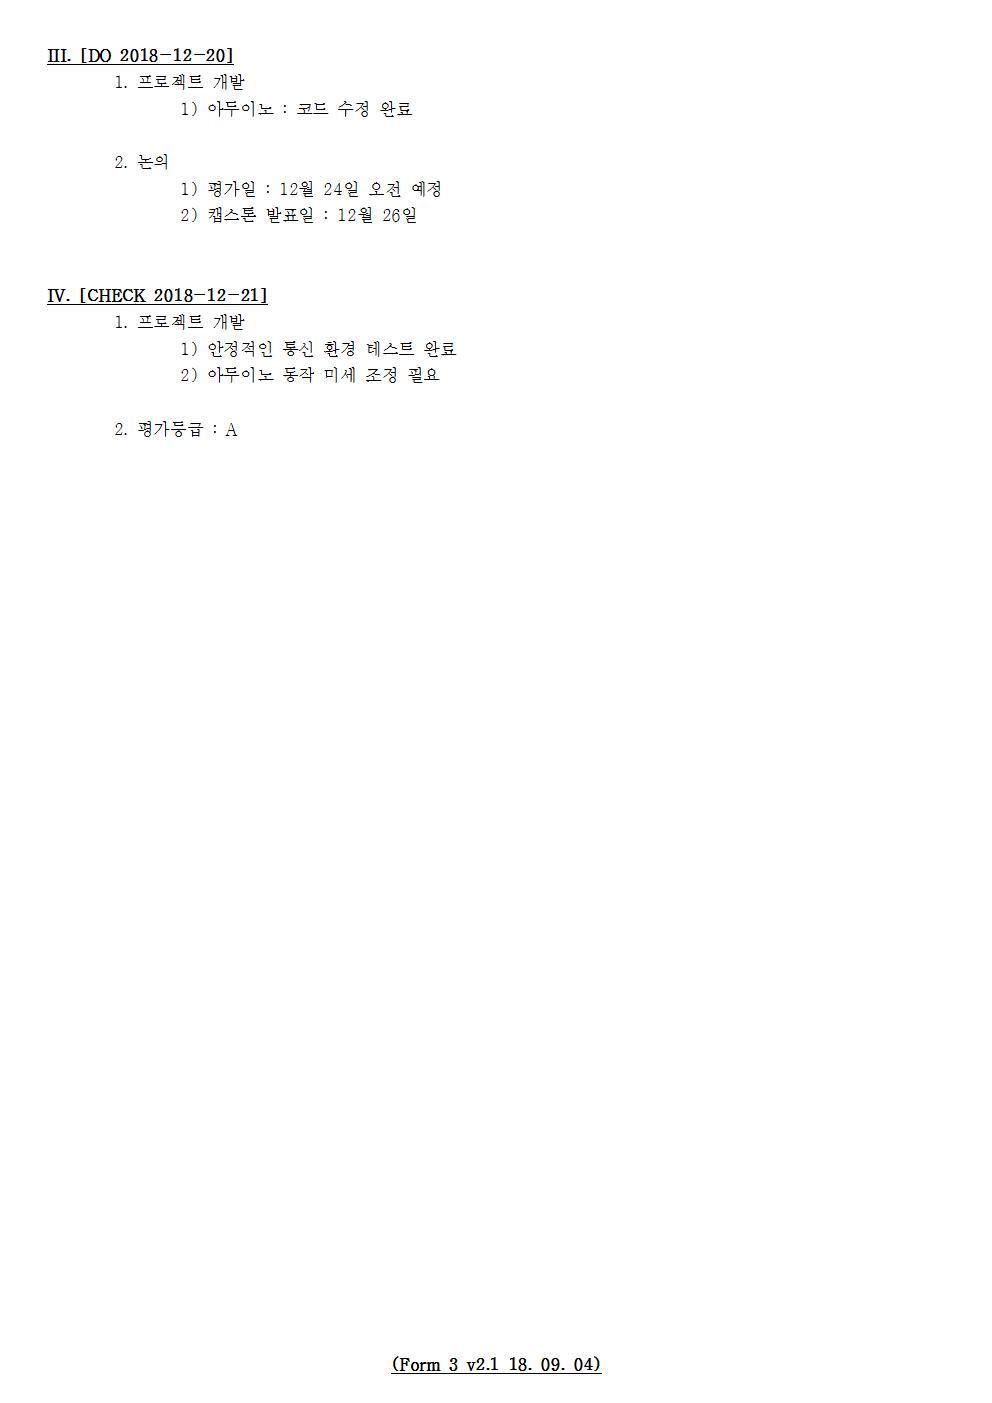 D-[18-049-LC-02]-[MM]-[2018-12-21][HH]002.jpg